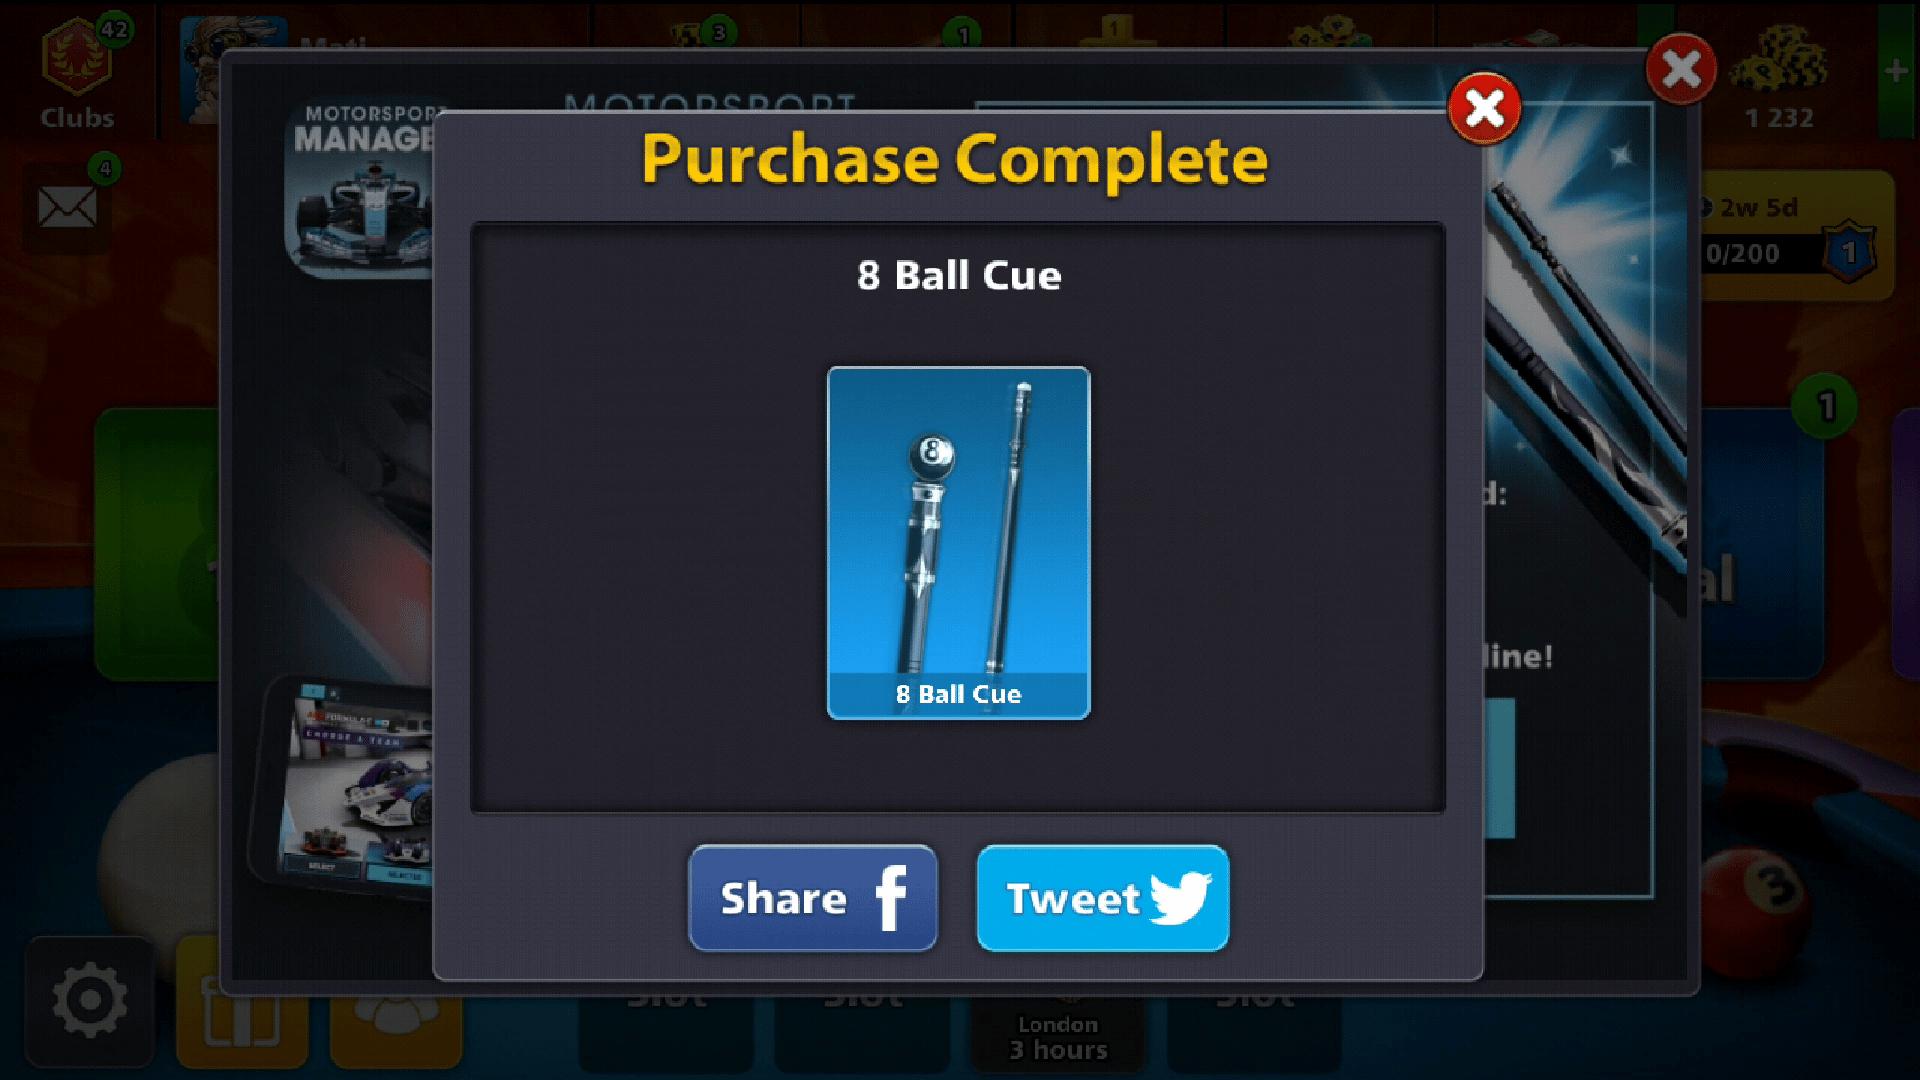 free 8 ball cue